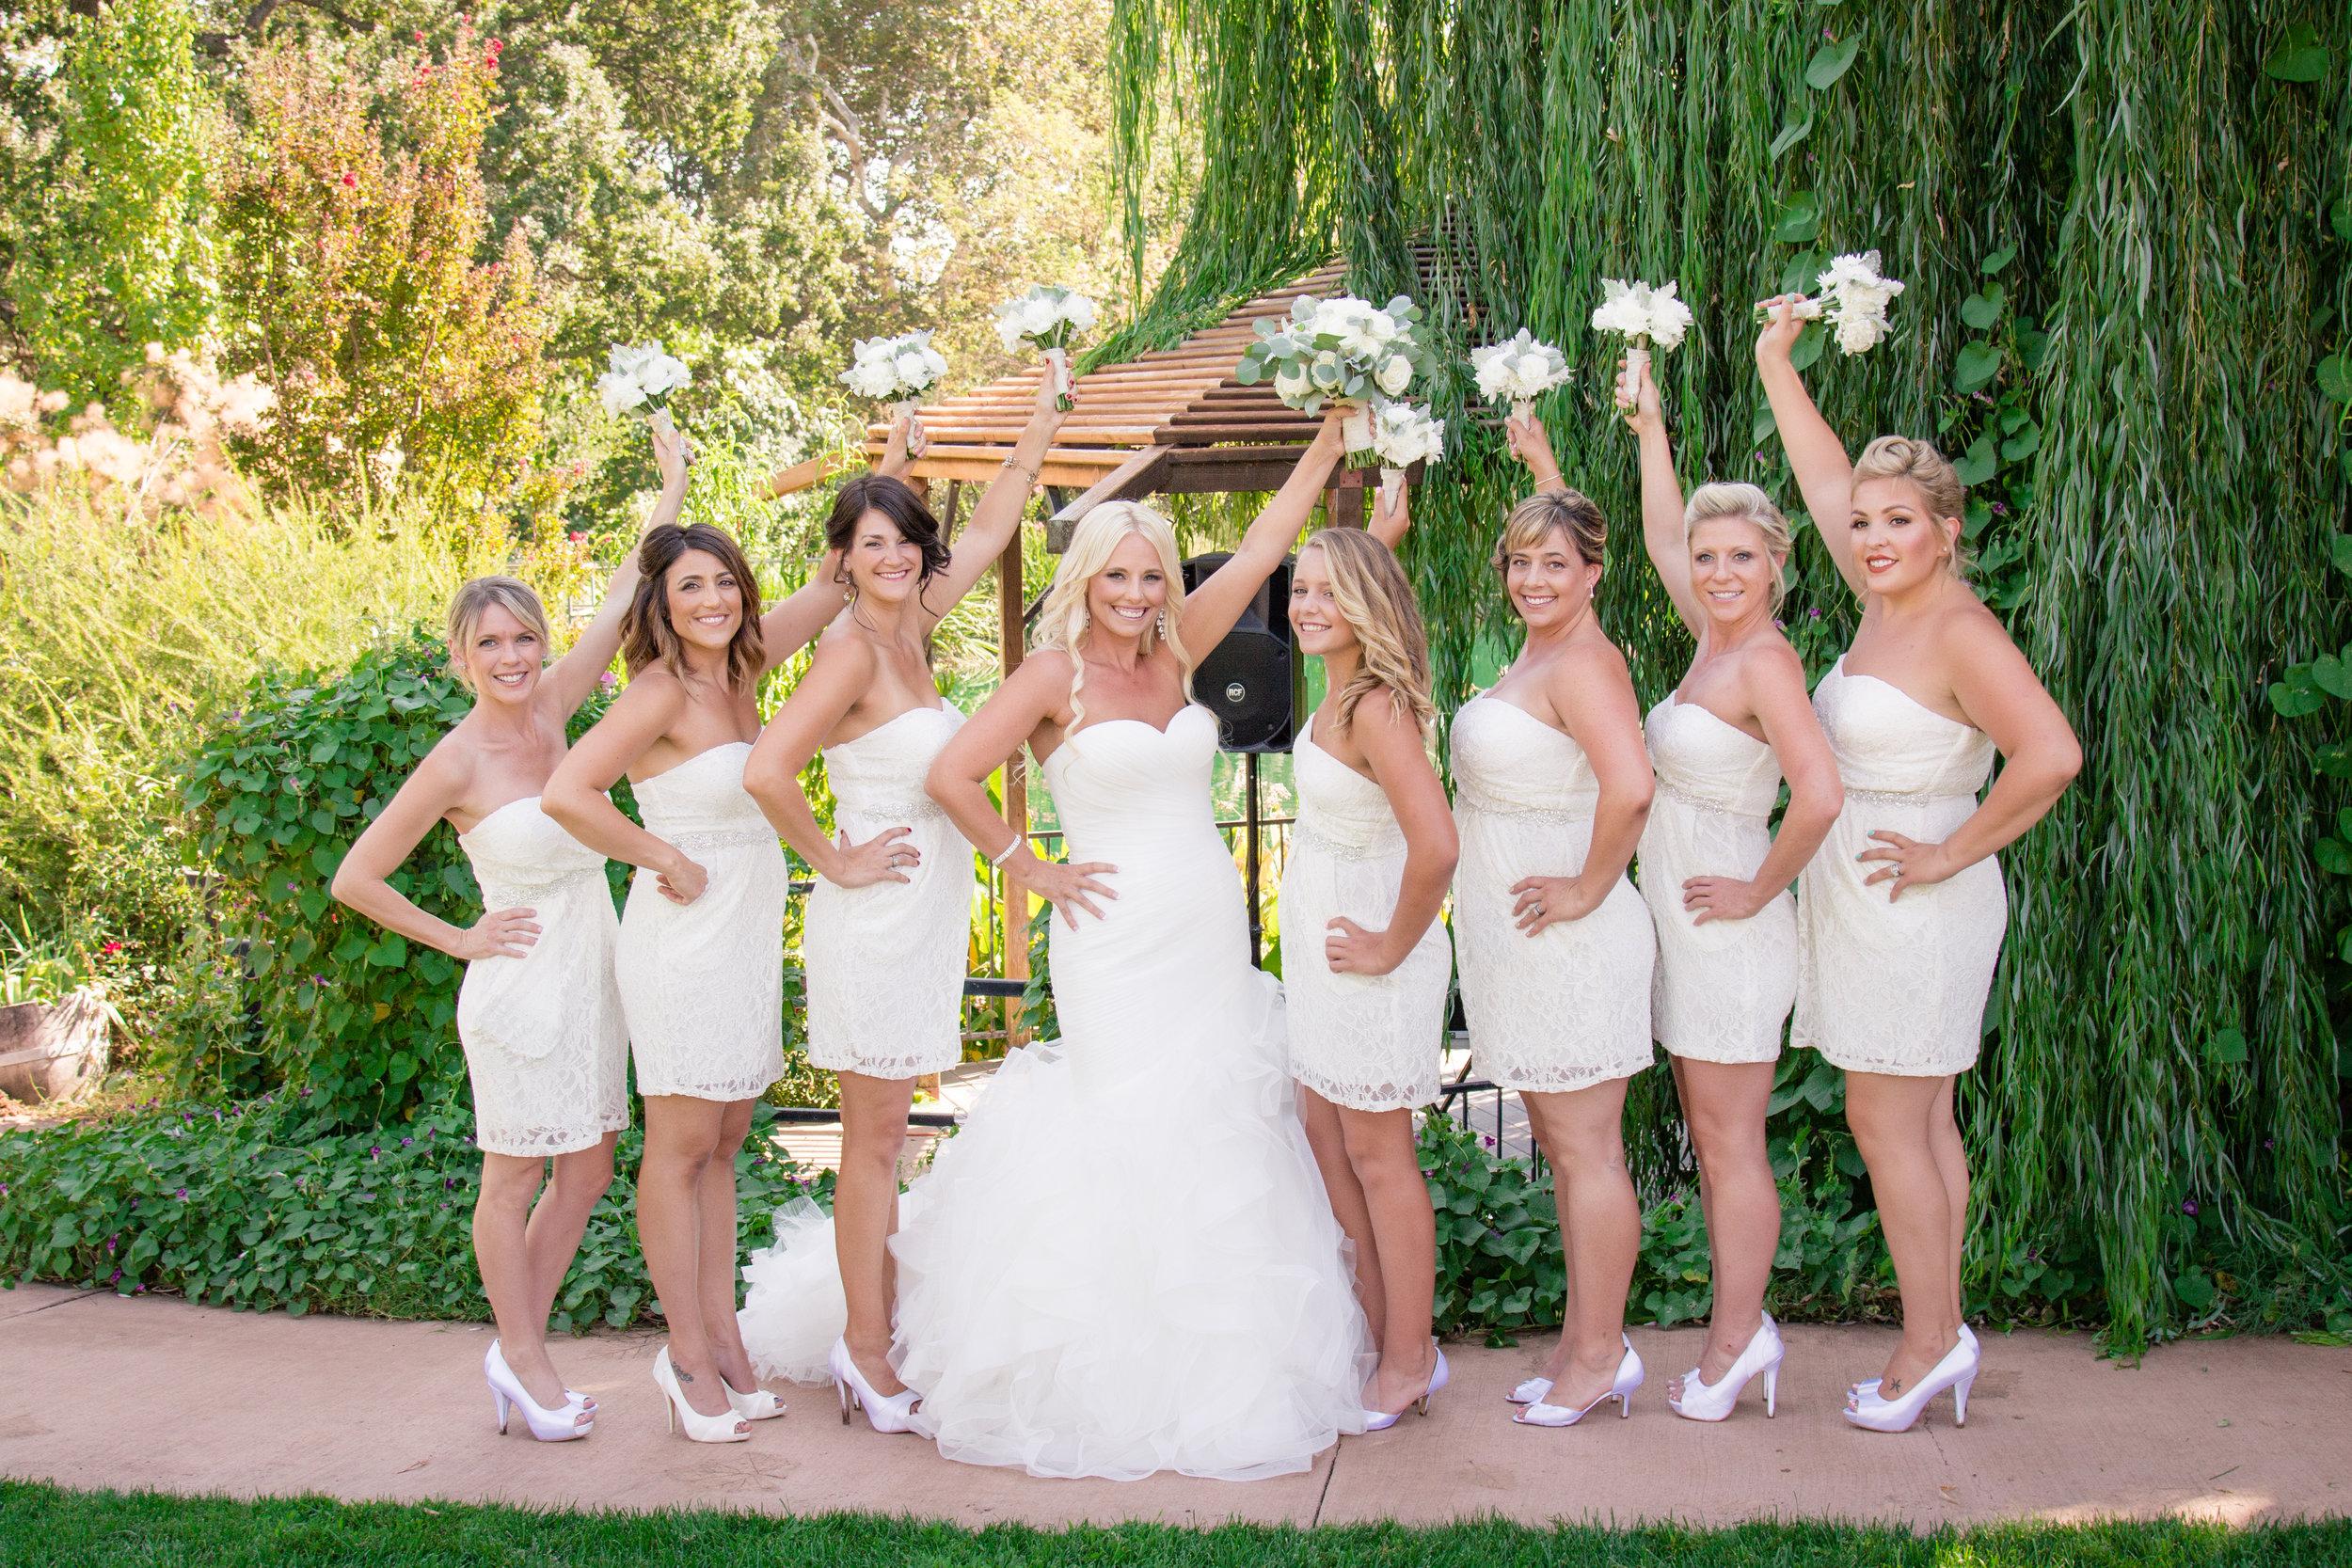 White Ranch Events - Chico - Ashley Teasley Photography - Sacramento Wedding Photographer11.JPG